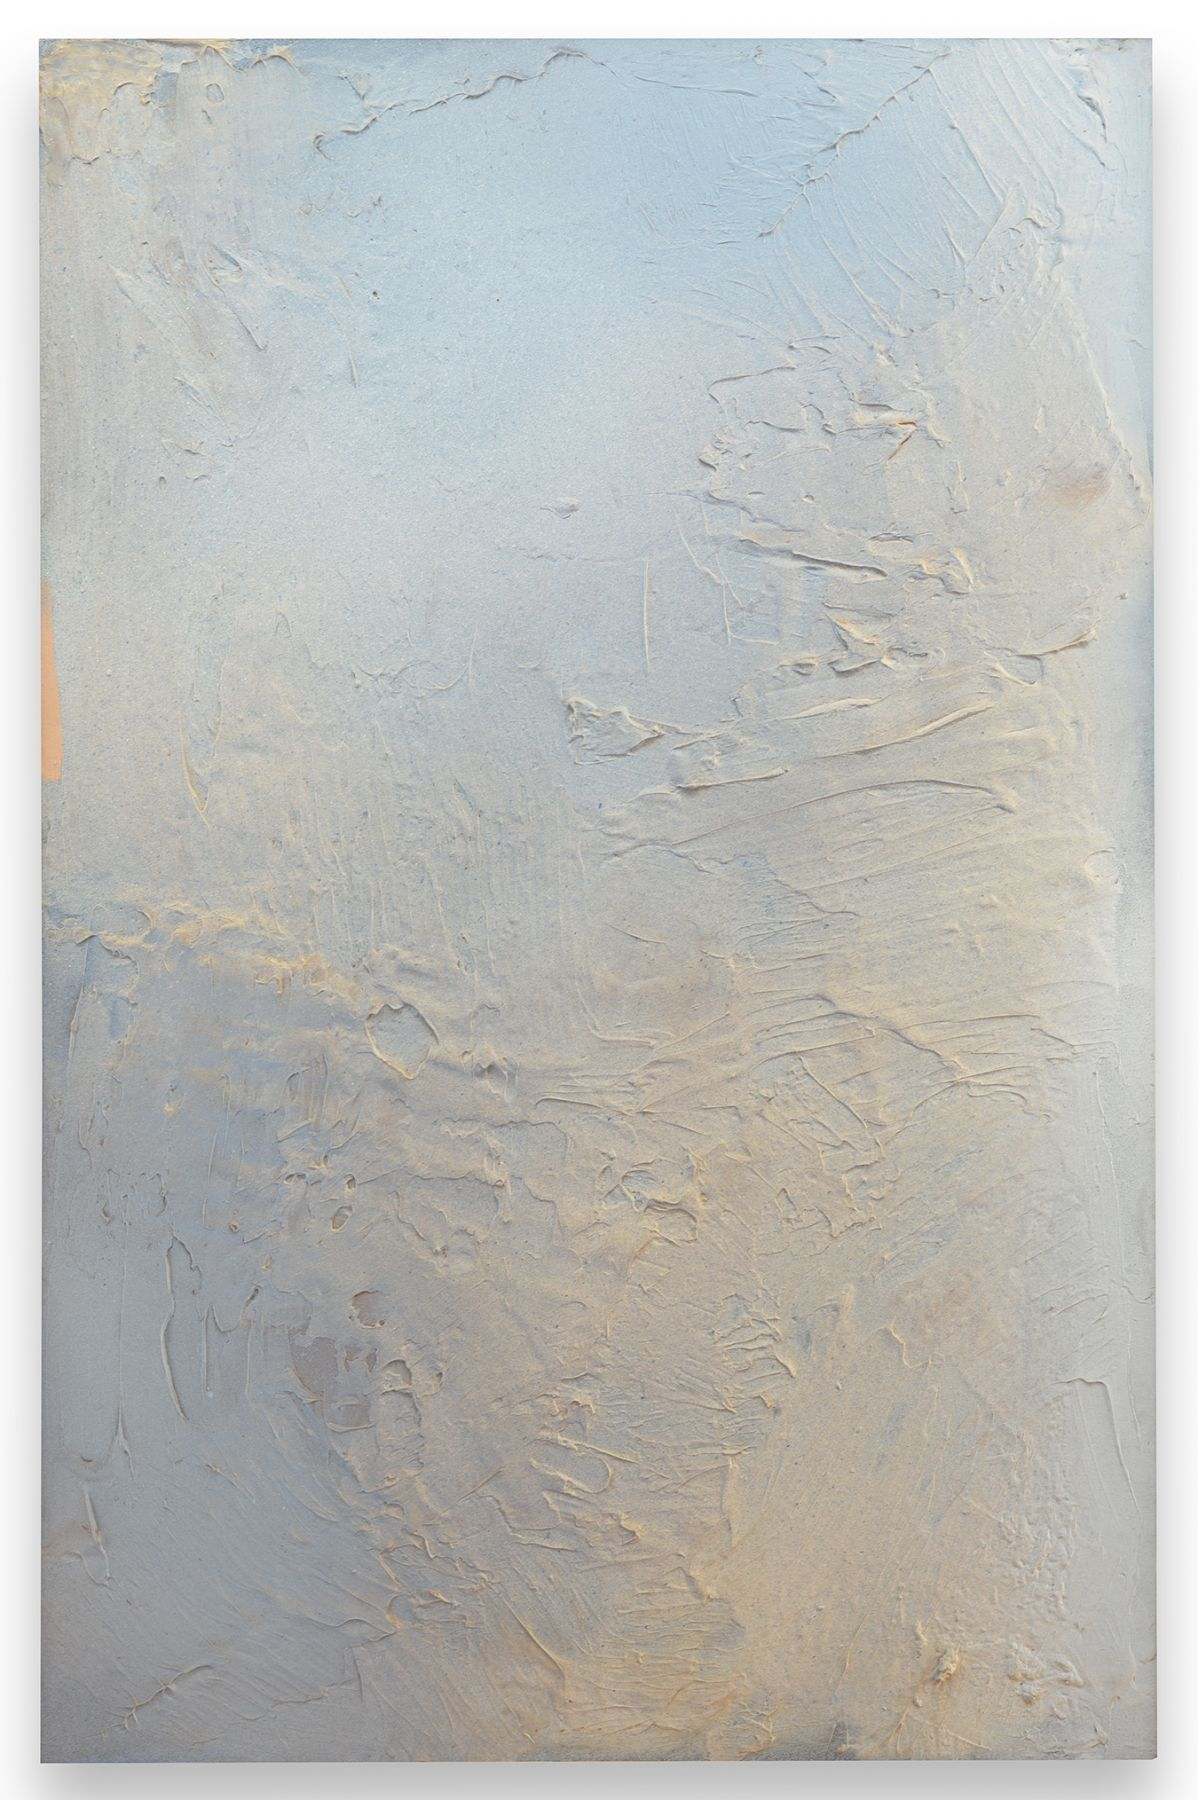 Cythera-2, 1977, Acrylic on canvas